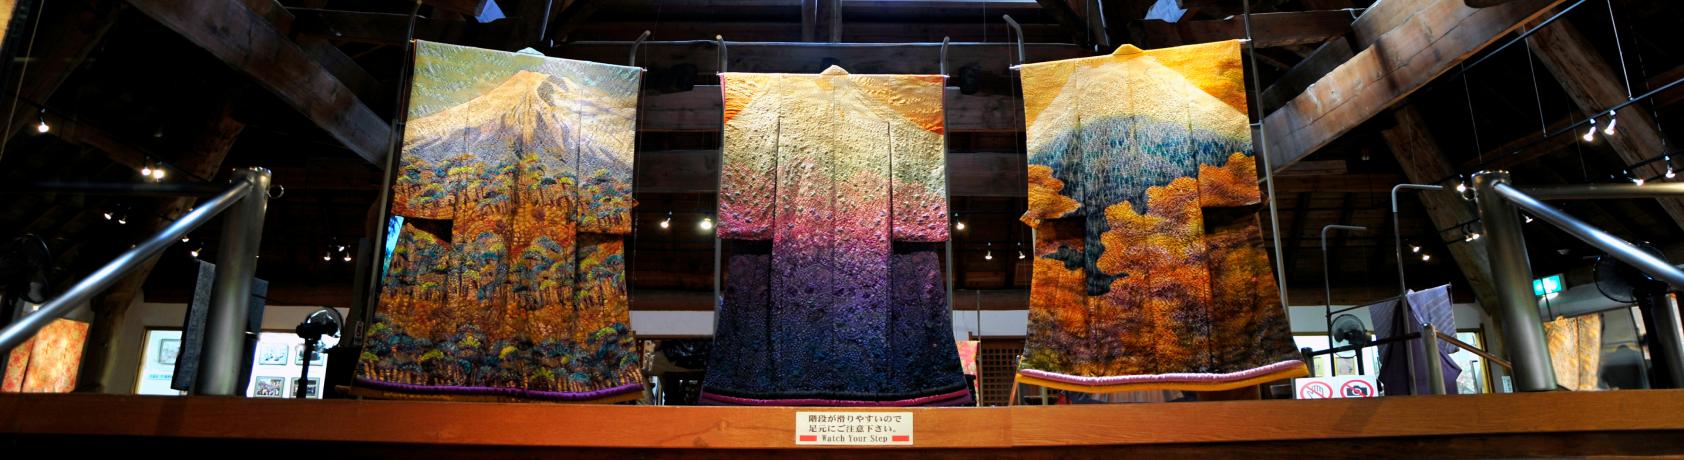 'Kimono' exhibit draws visitors from around US